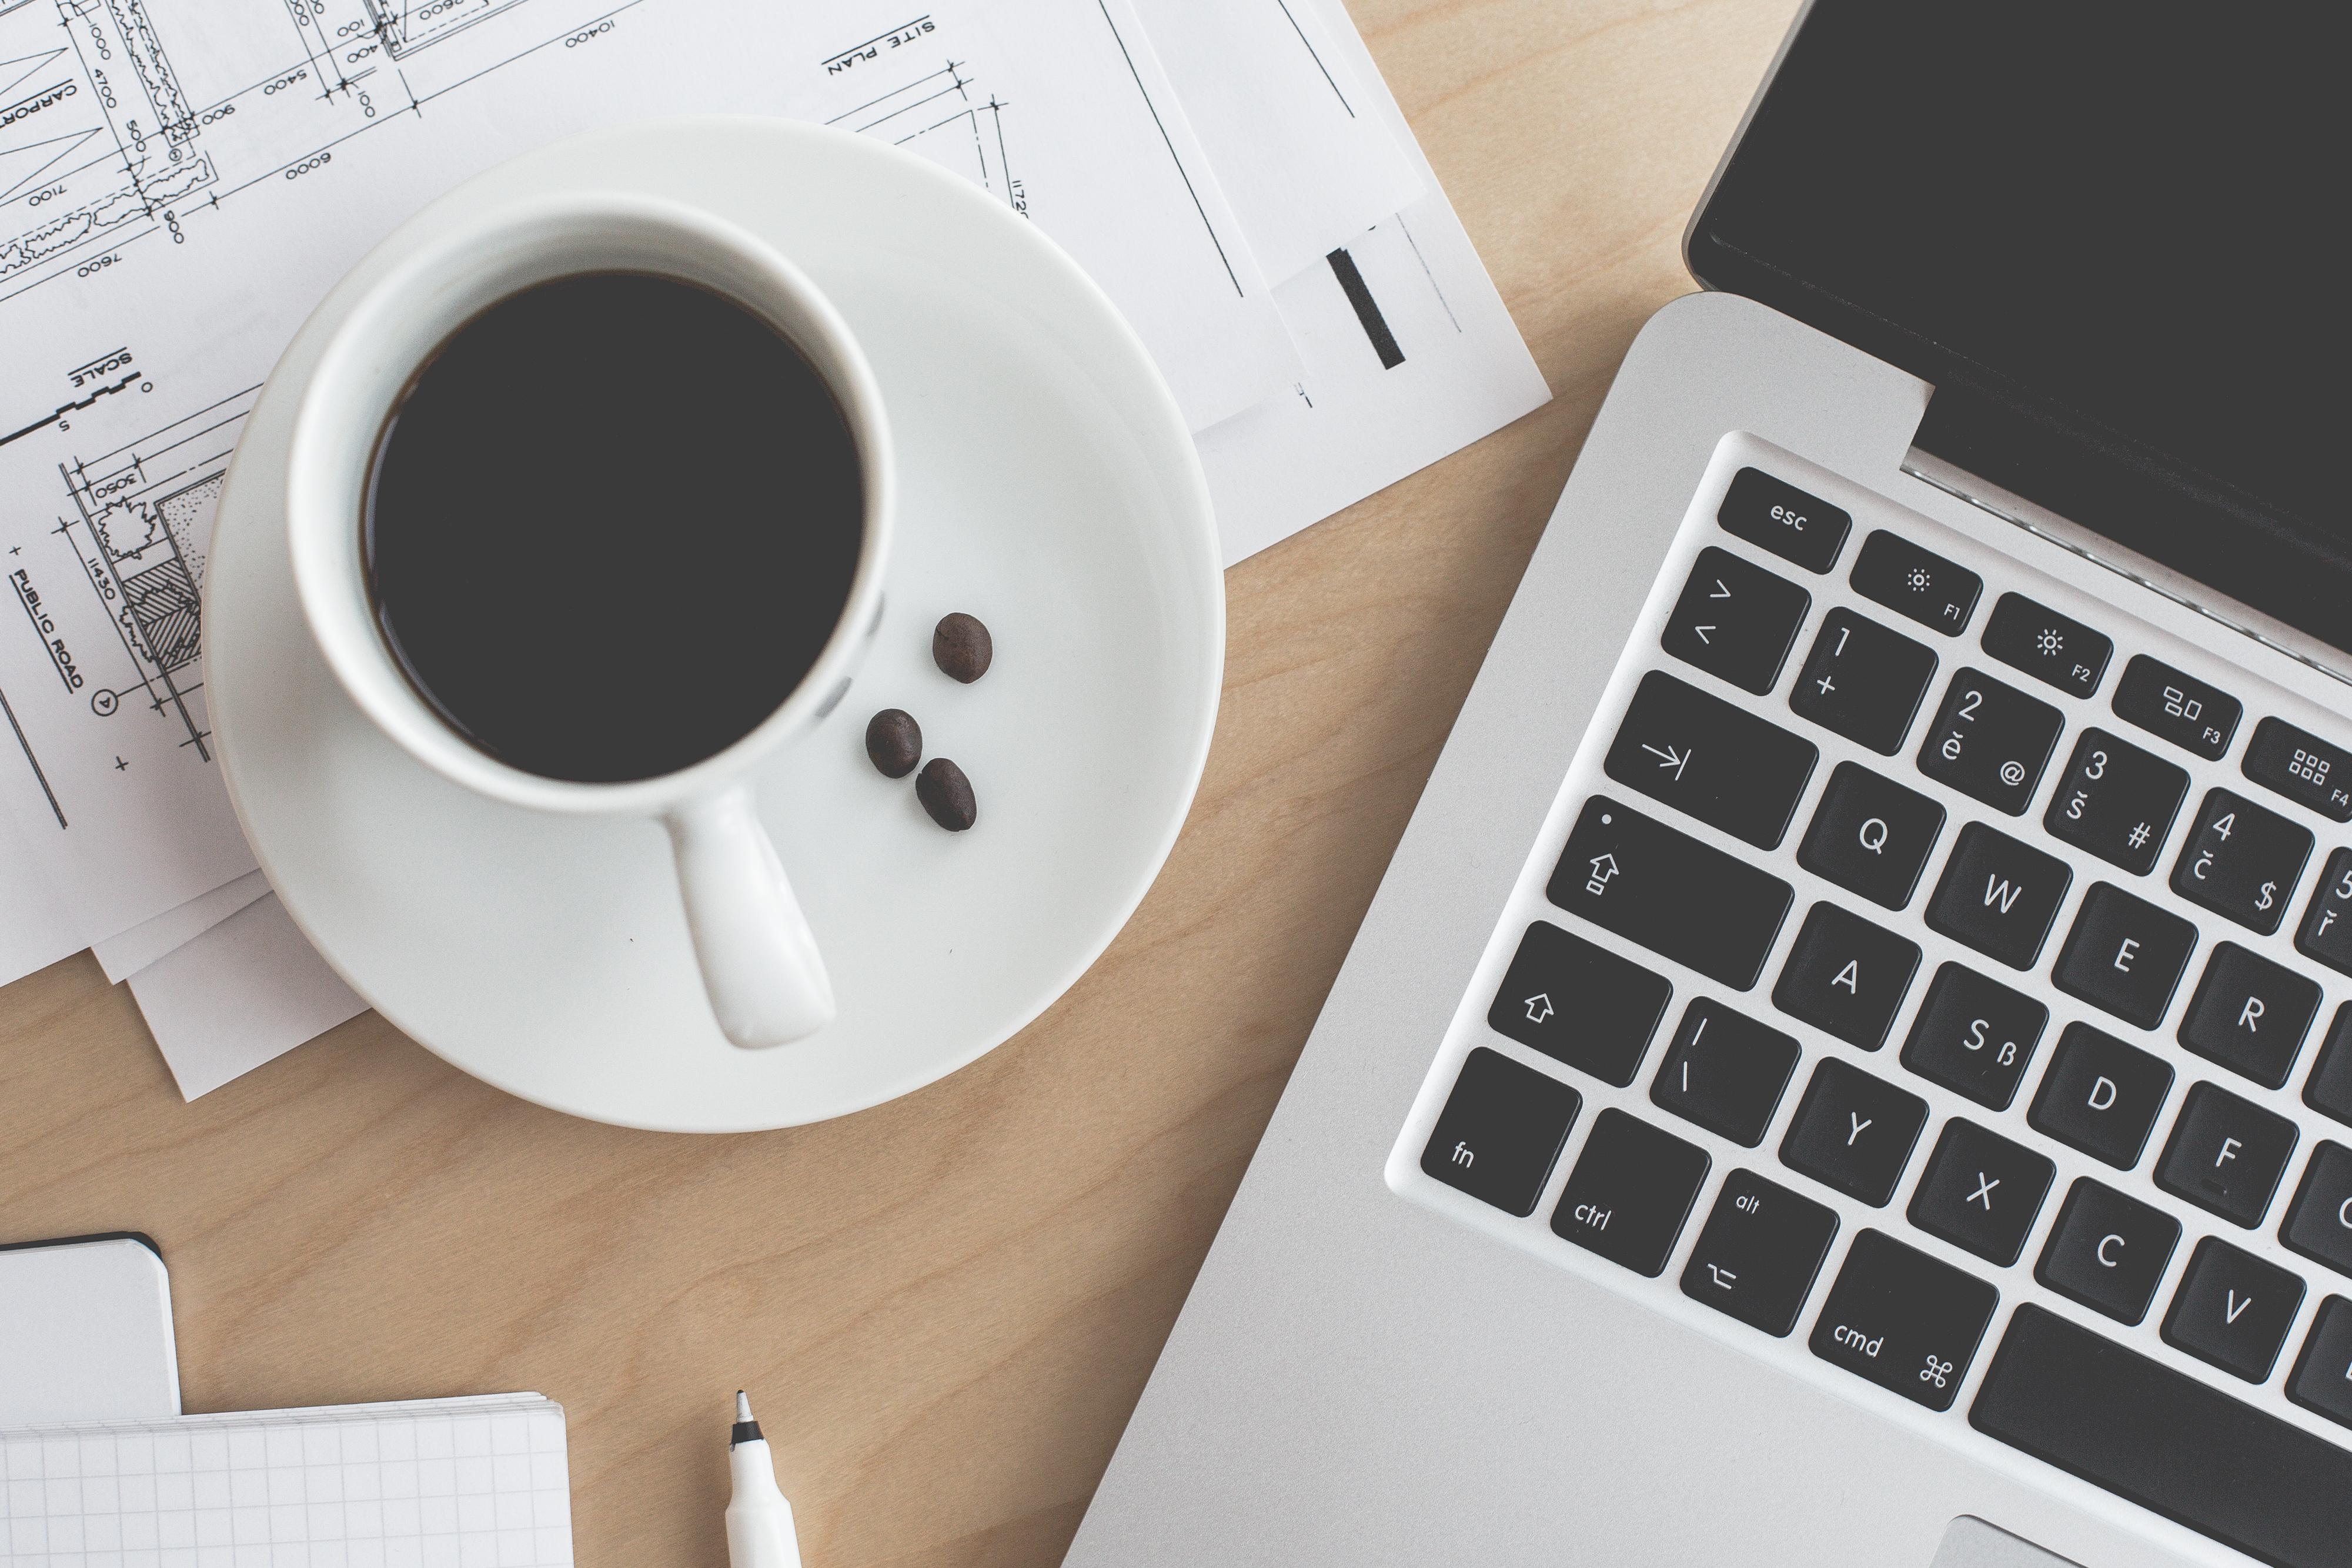 coffee-laptop-business-work-still-life-picjumbo-com